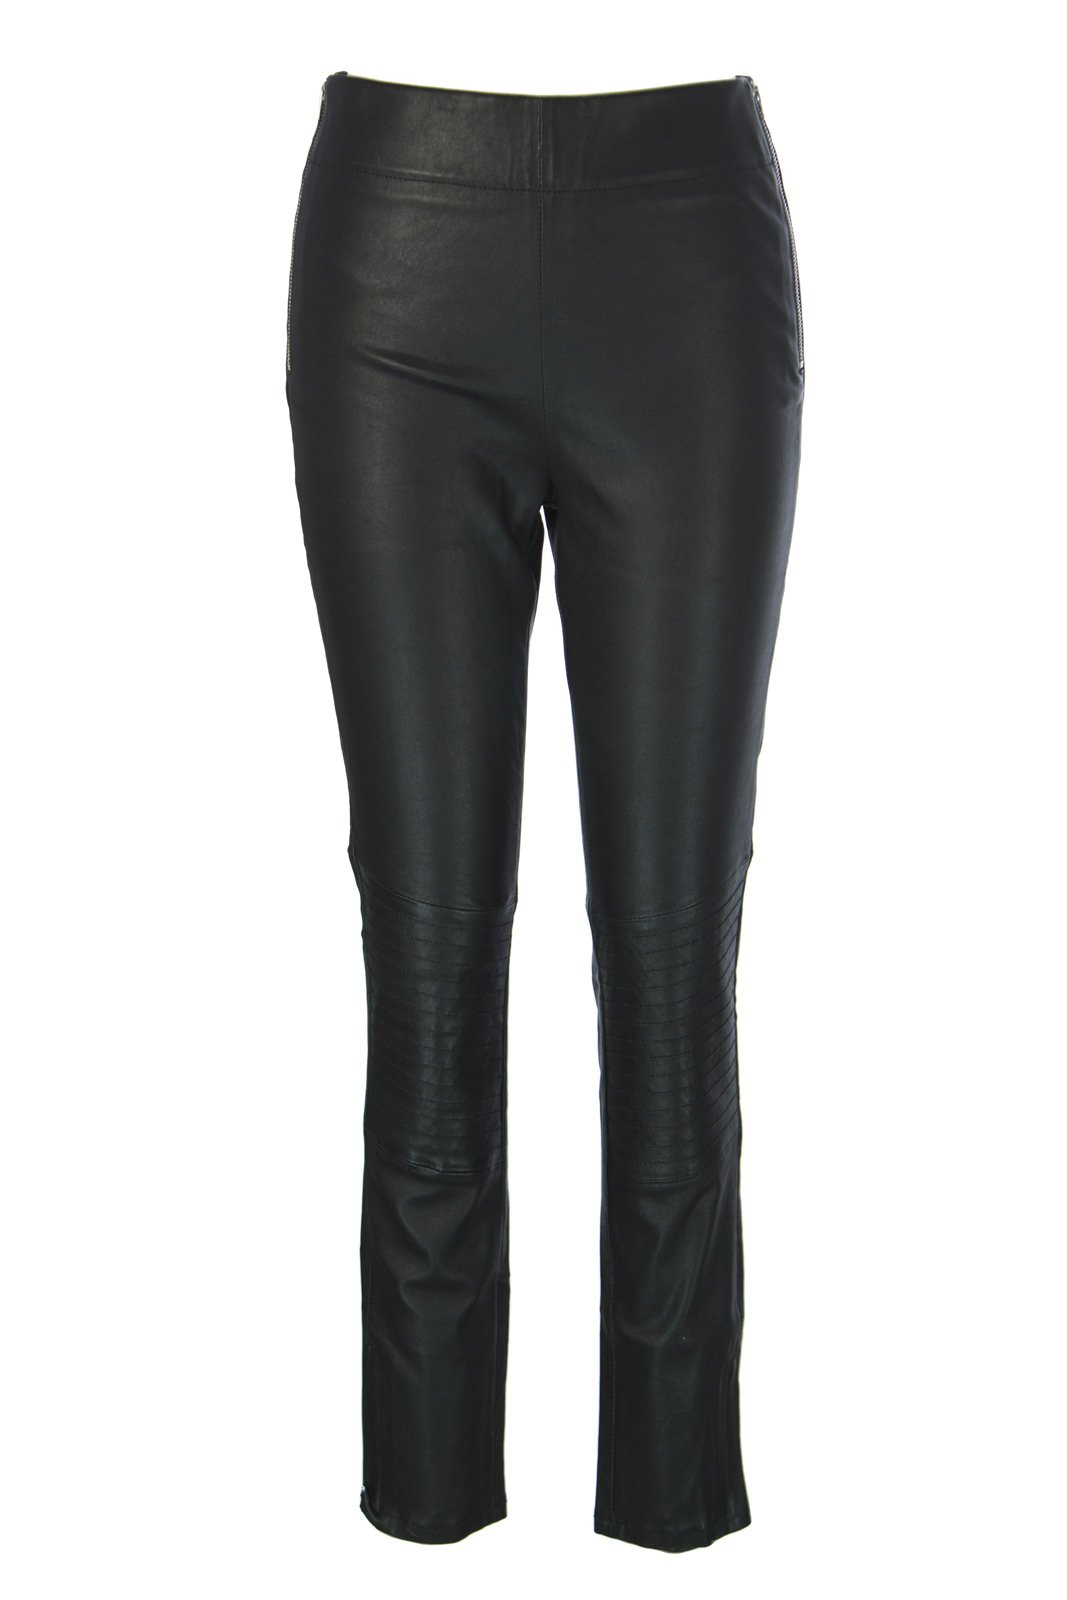 Surface to Air Women's Leather Ella Leggings 40 Black